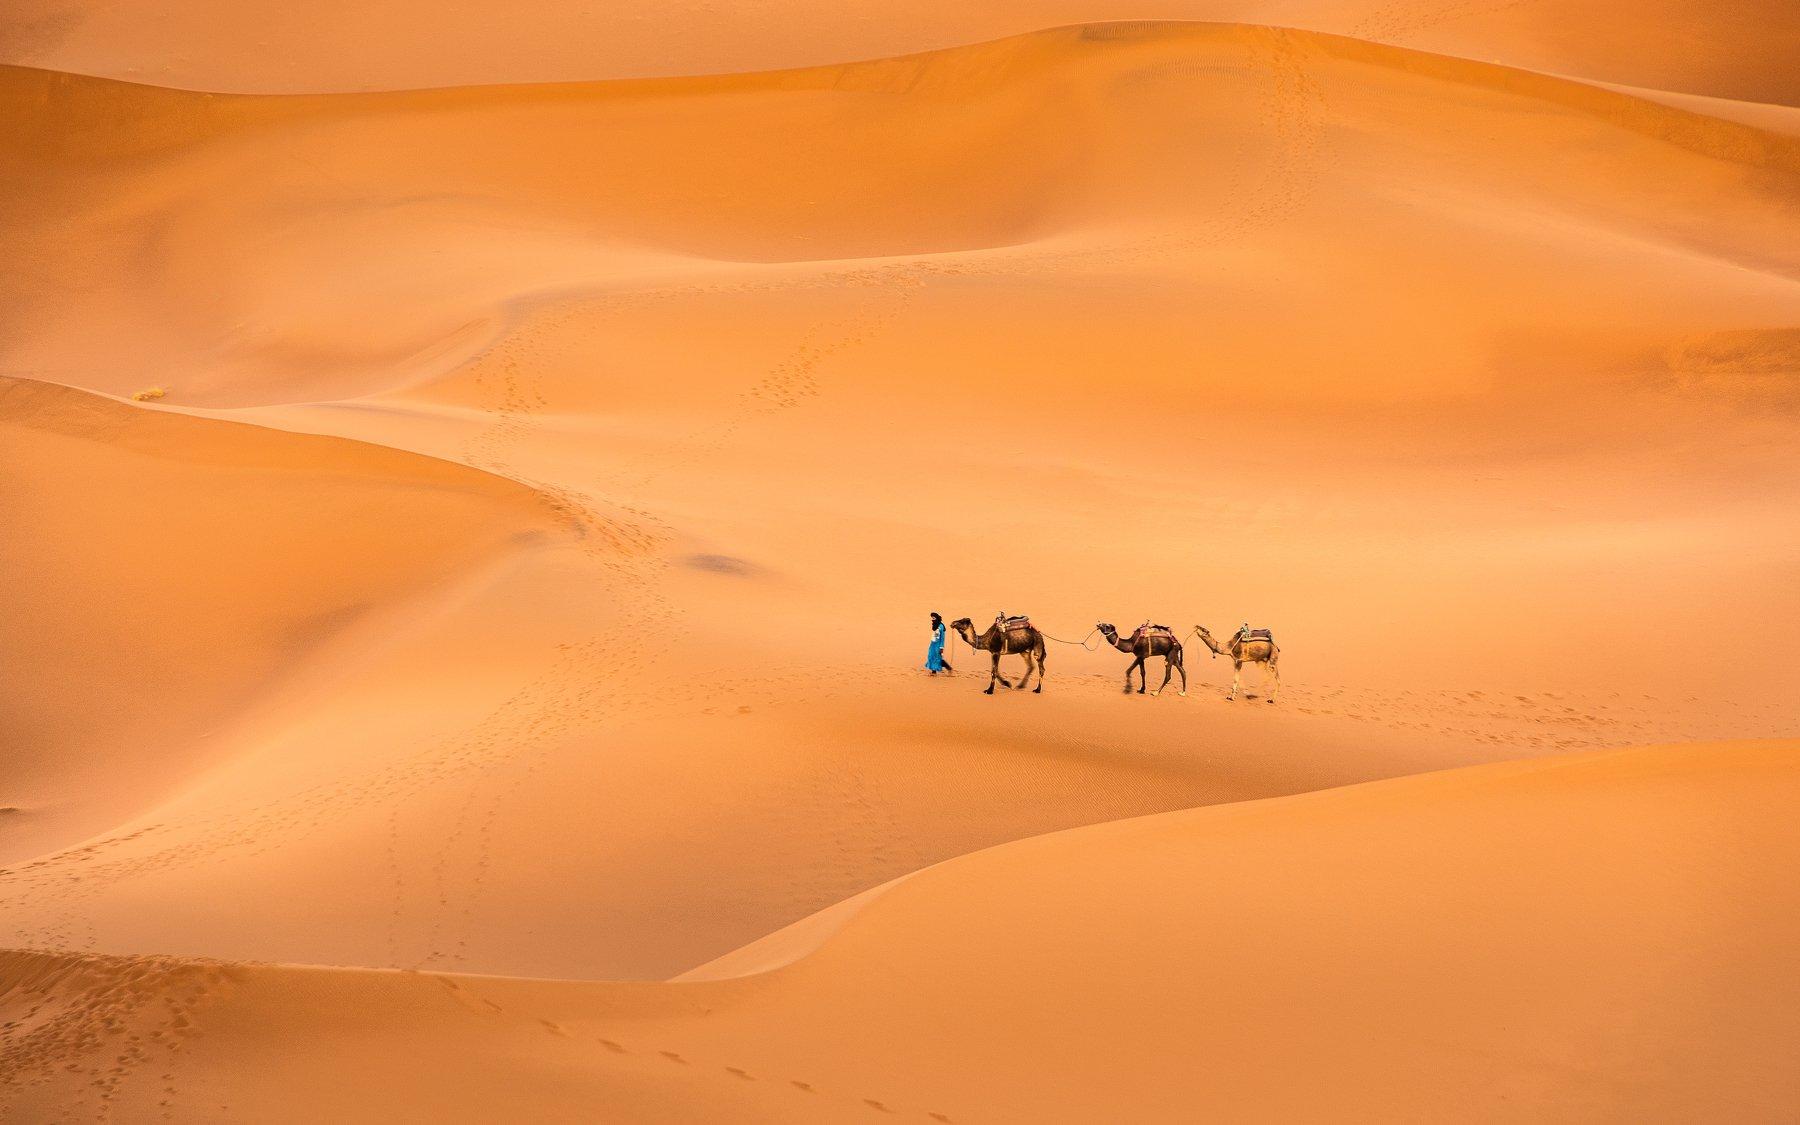 Sahara, Maroc, Camels, Sand, Prybinski